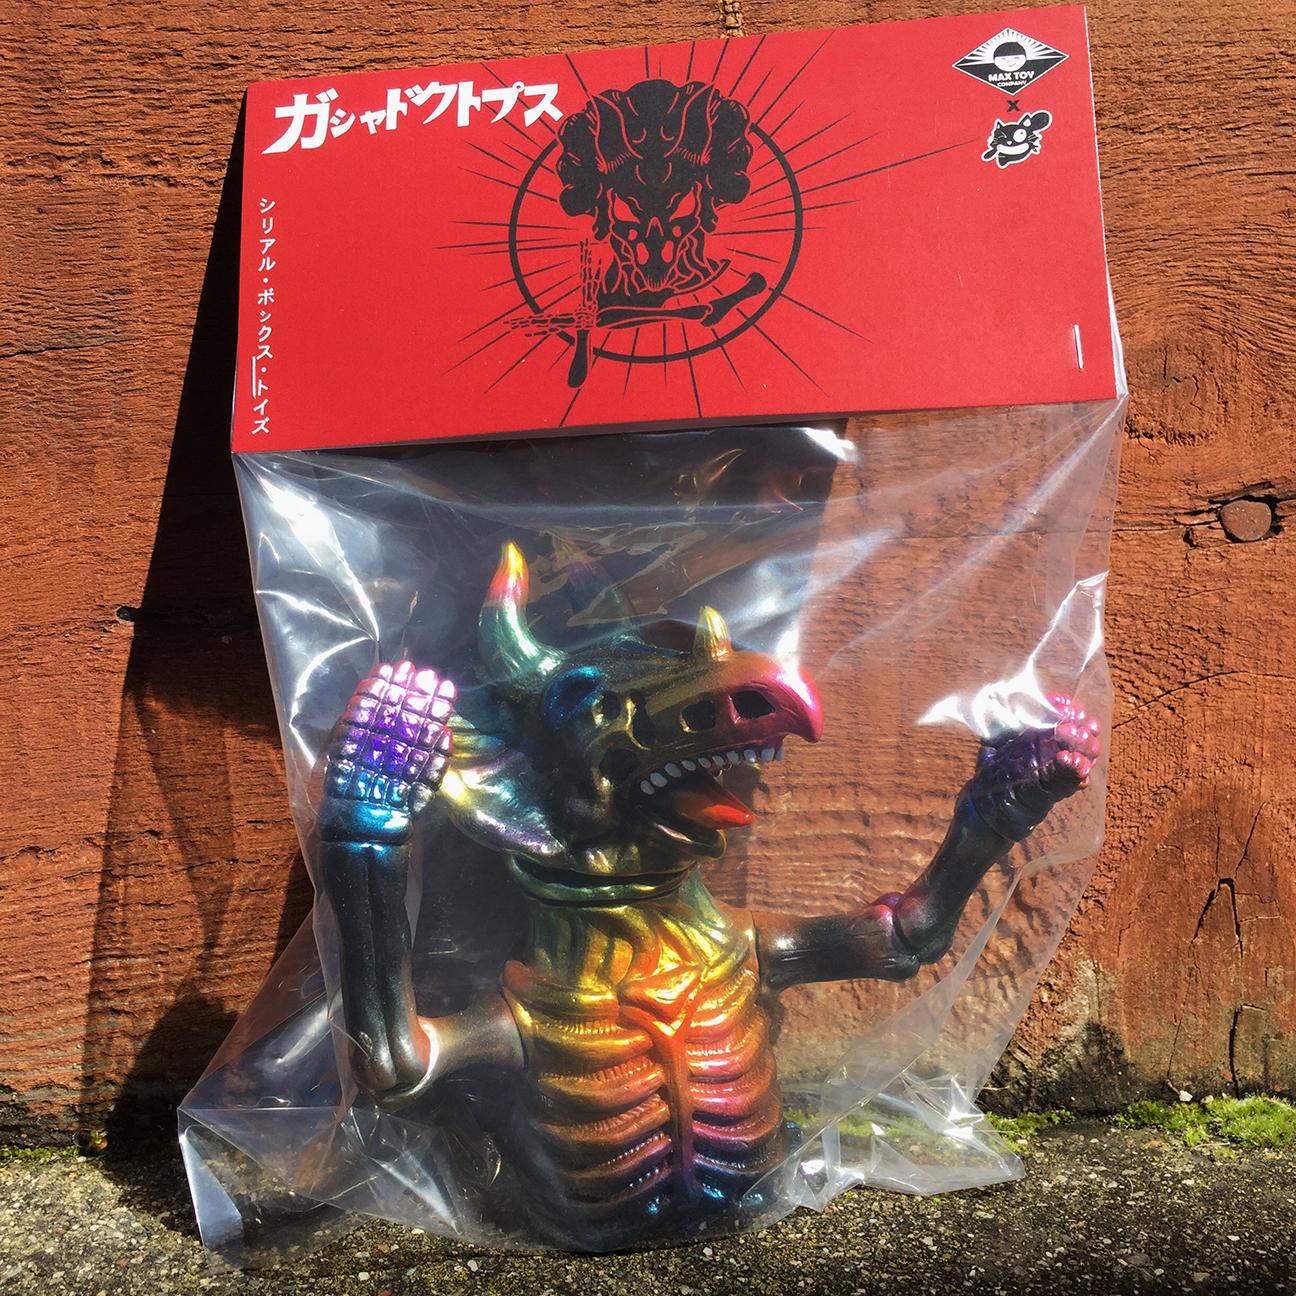 Custom Gashadokutops Cereal Box Toys x Mark Nagata C type